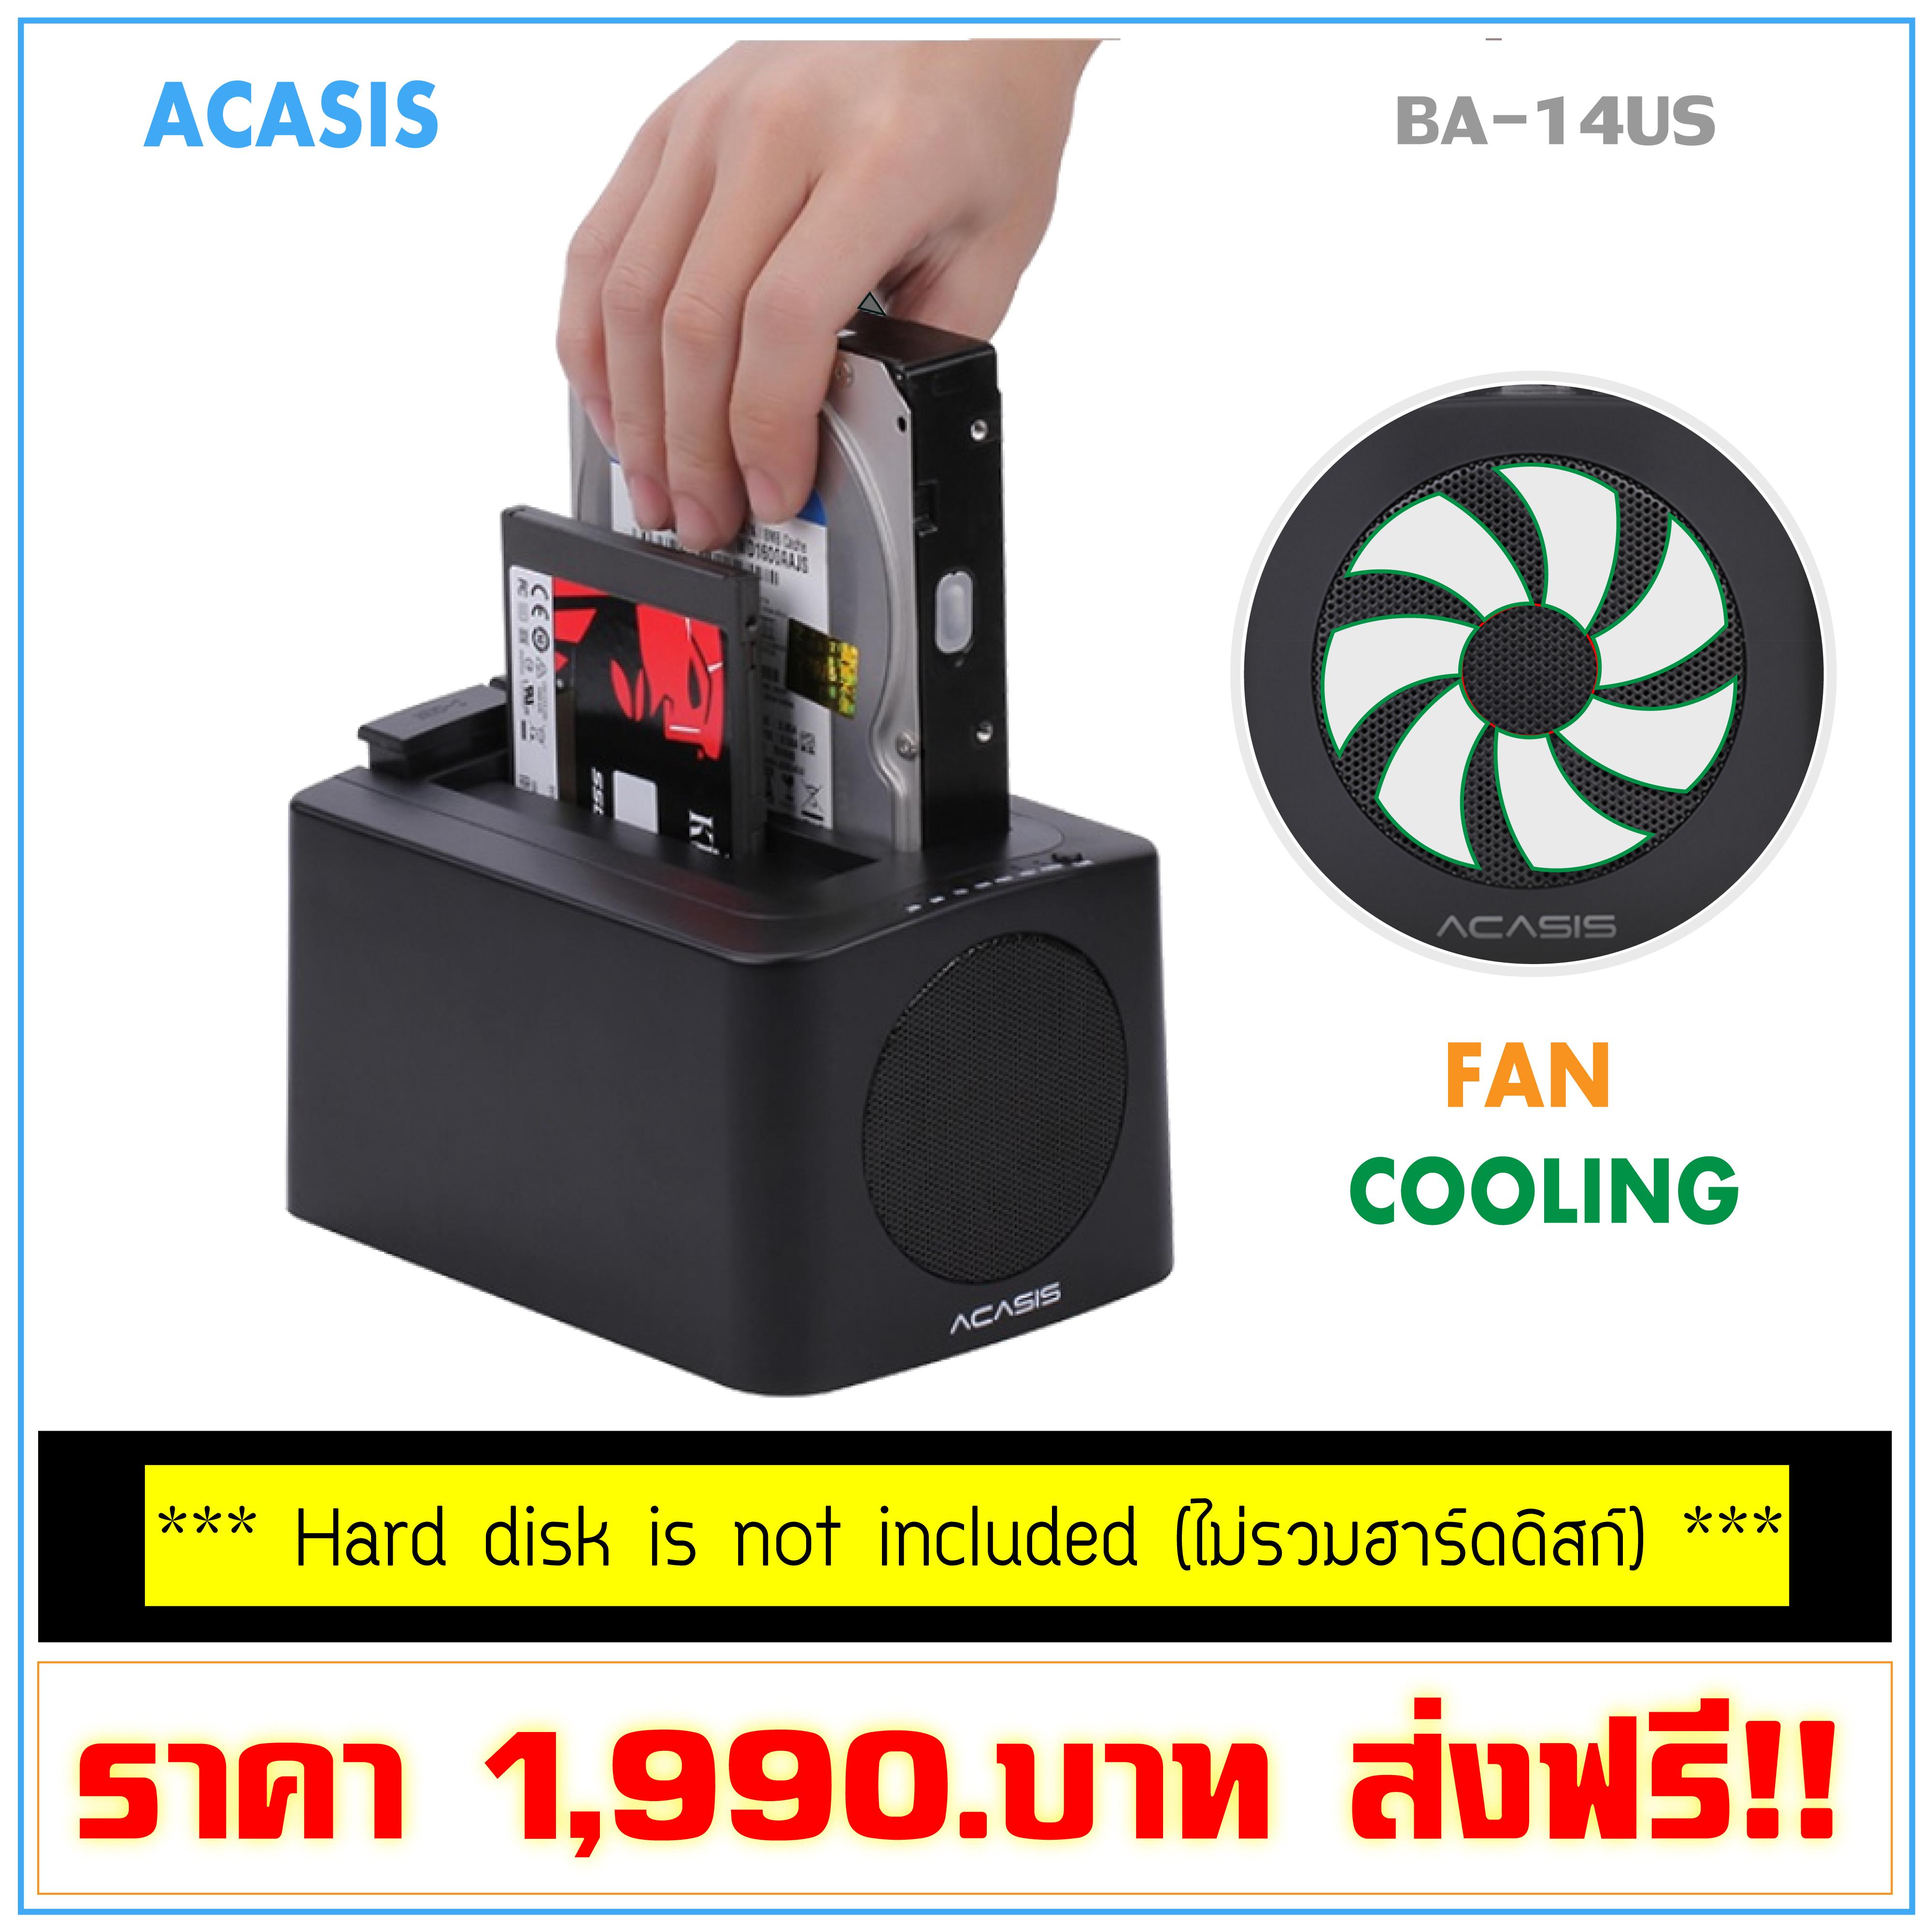 Acasis 2 Bay USB 3.0 to SATA HDD SSD External Dock W/ Fan Offline Cloning Black